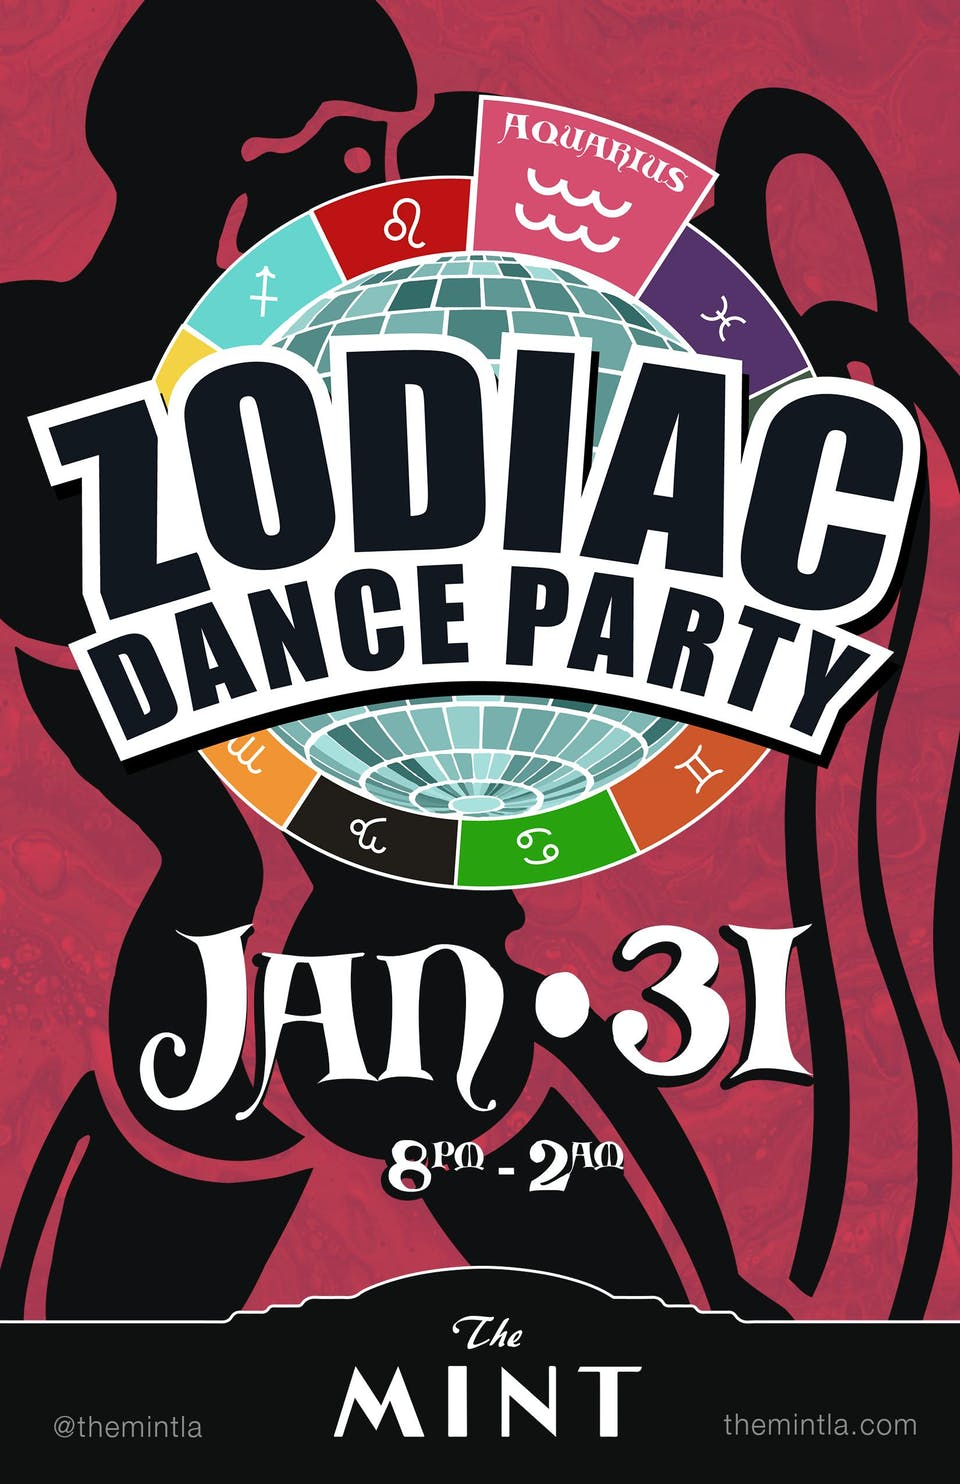 ZODIAC DANCE PARTY, CELEBRATING AQUARIUS - Free Tacos for 1st Hour!!!